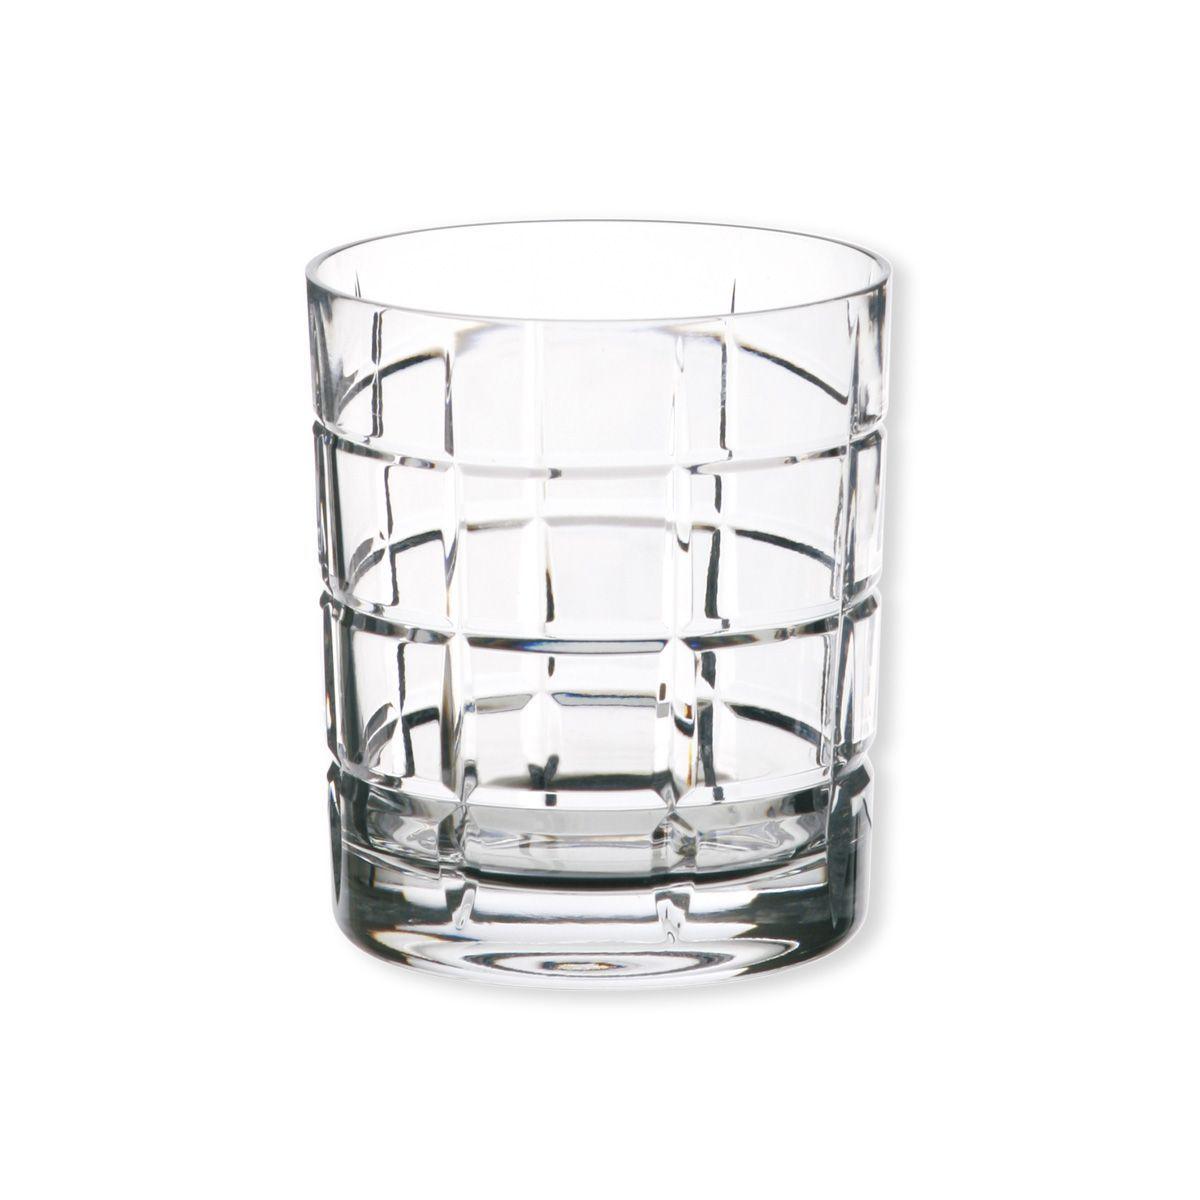 Gobelet whisky timesquare bruno evrard cr ation - Carafe whisky maison du monde ...